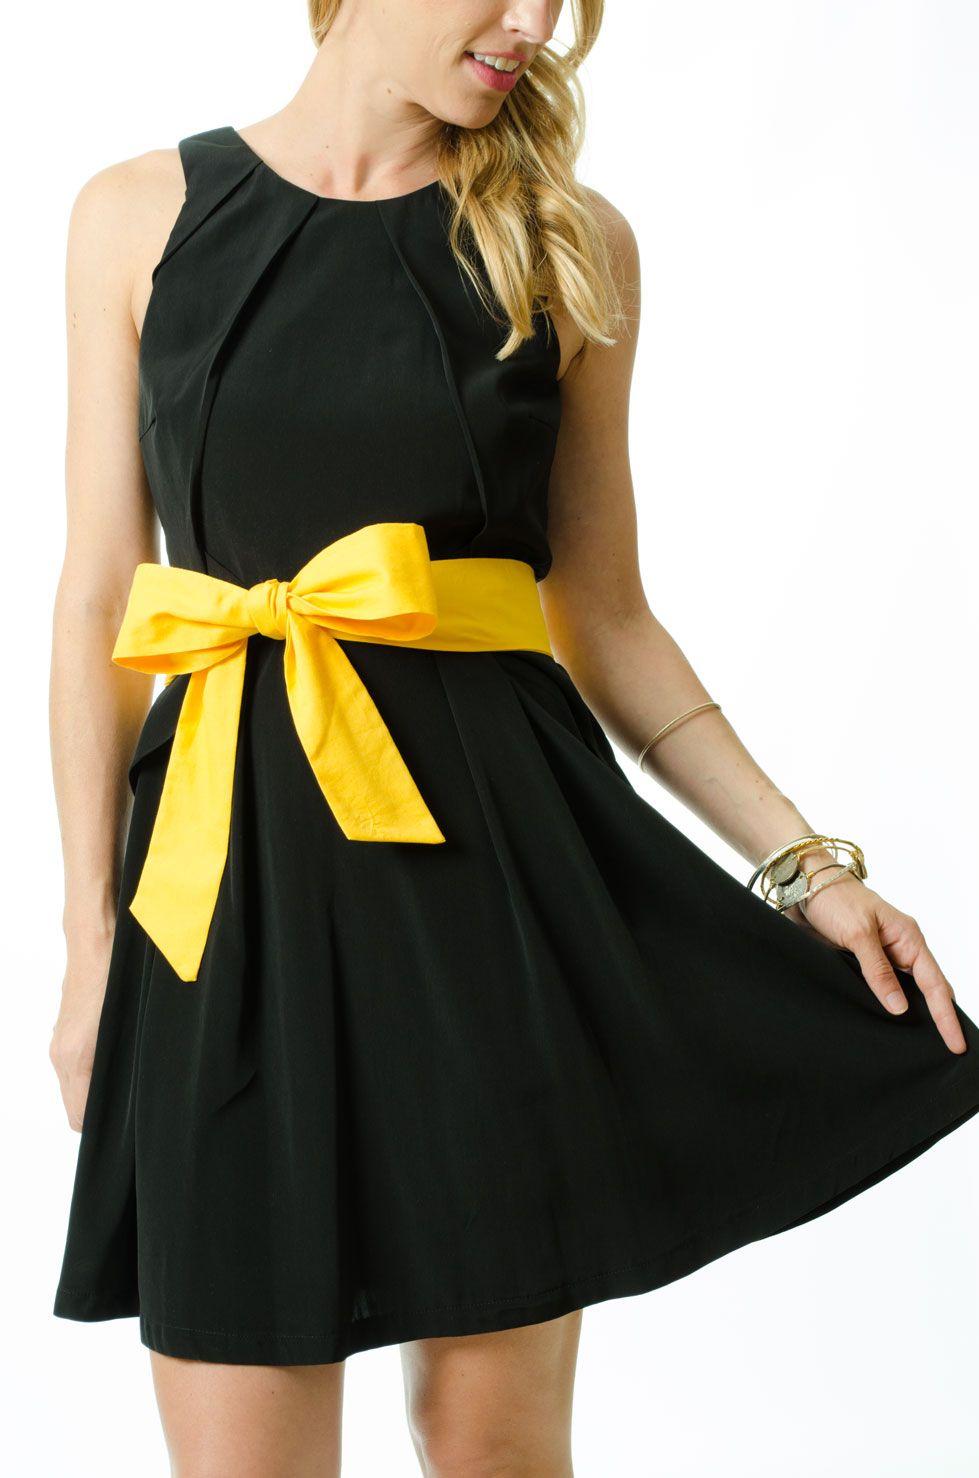 Black dress yellow sash - Black Dress Yellow Sash 2